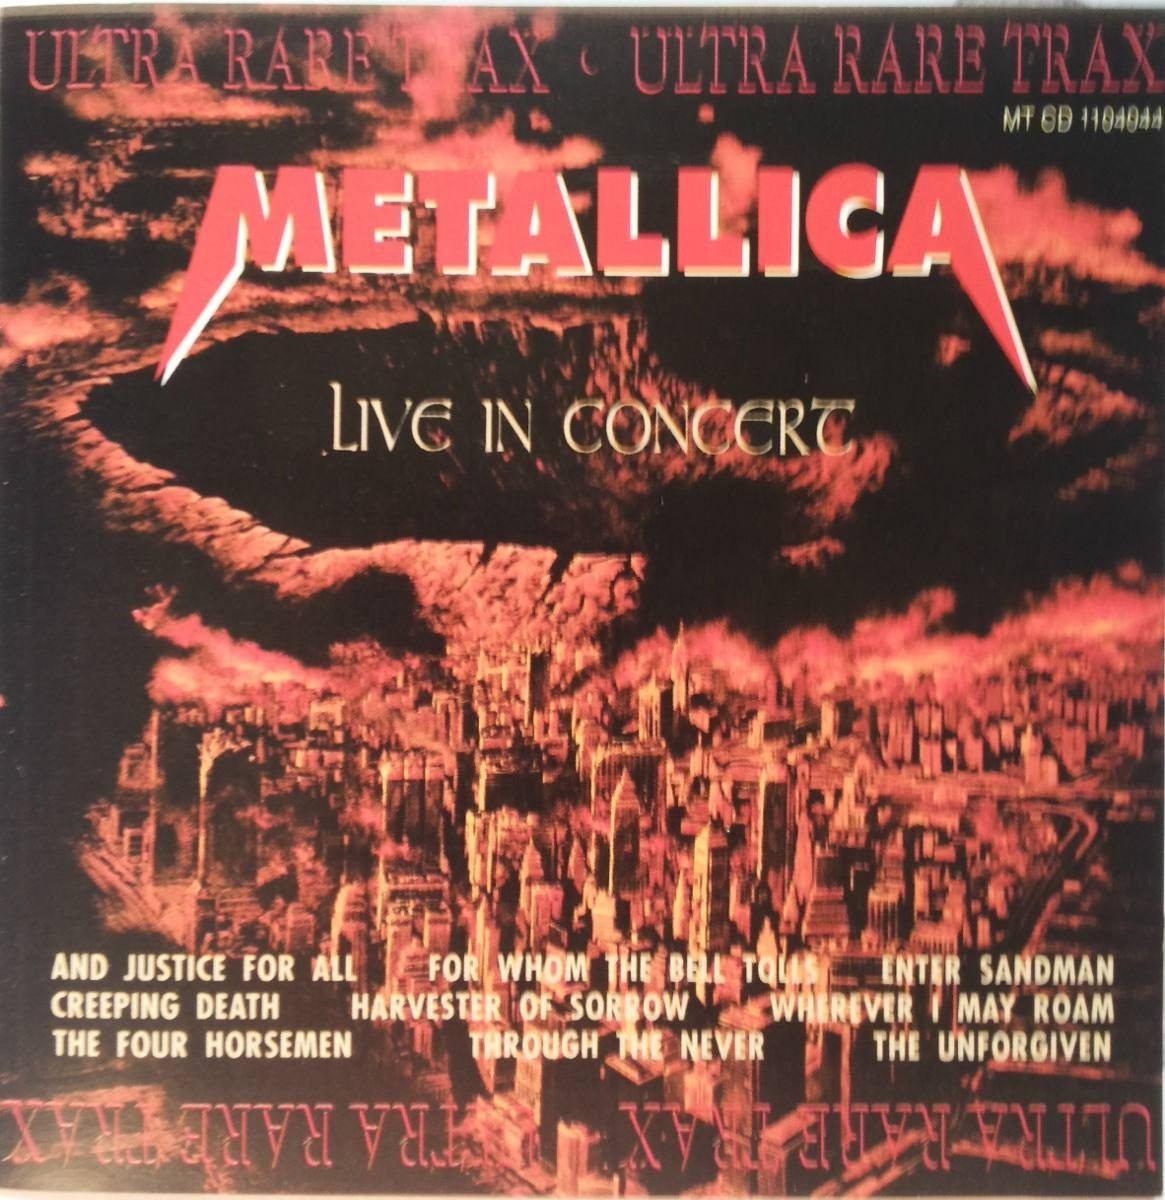 Cd Lacrado Metallica And Justice For All Live In Concert 199 Carregando Zoom